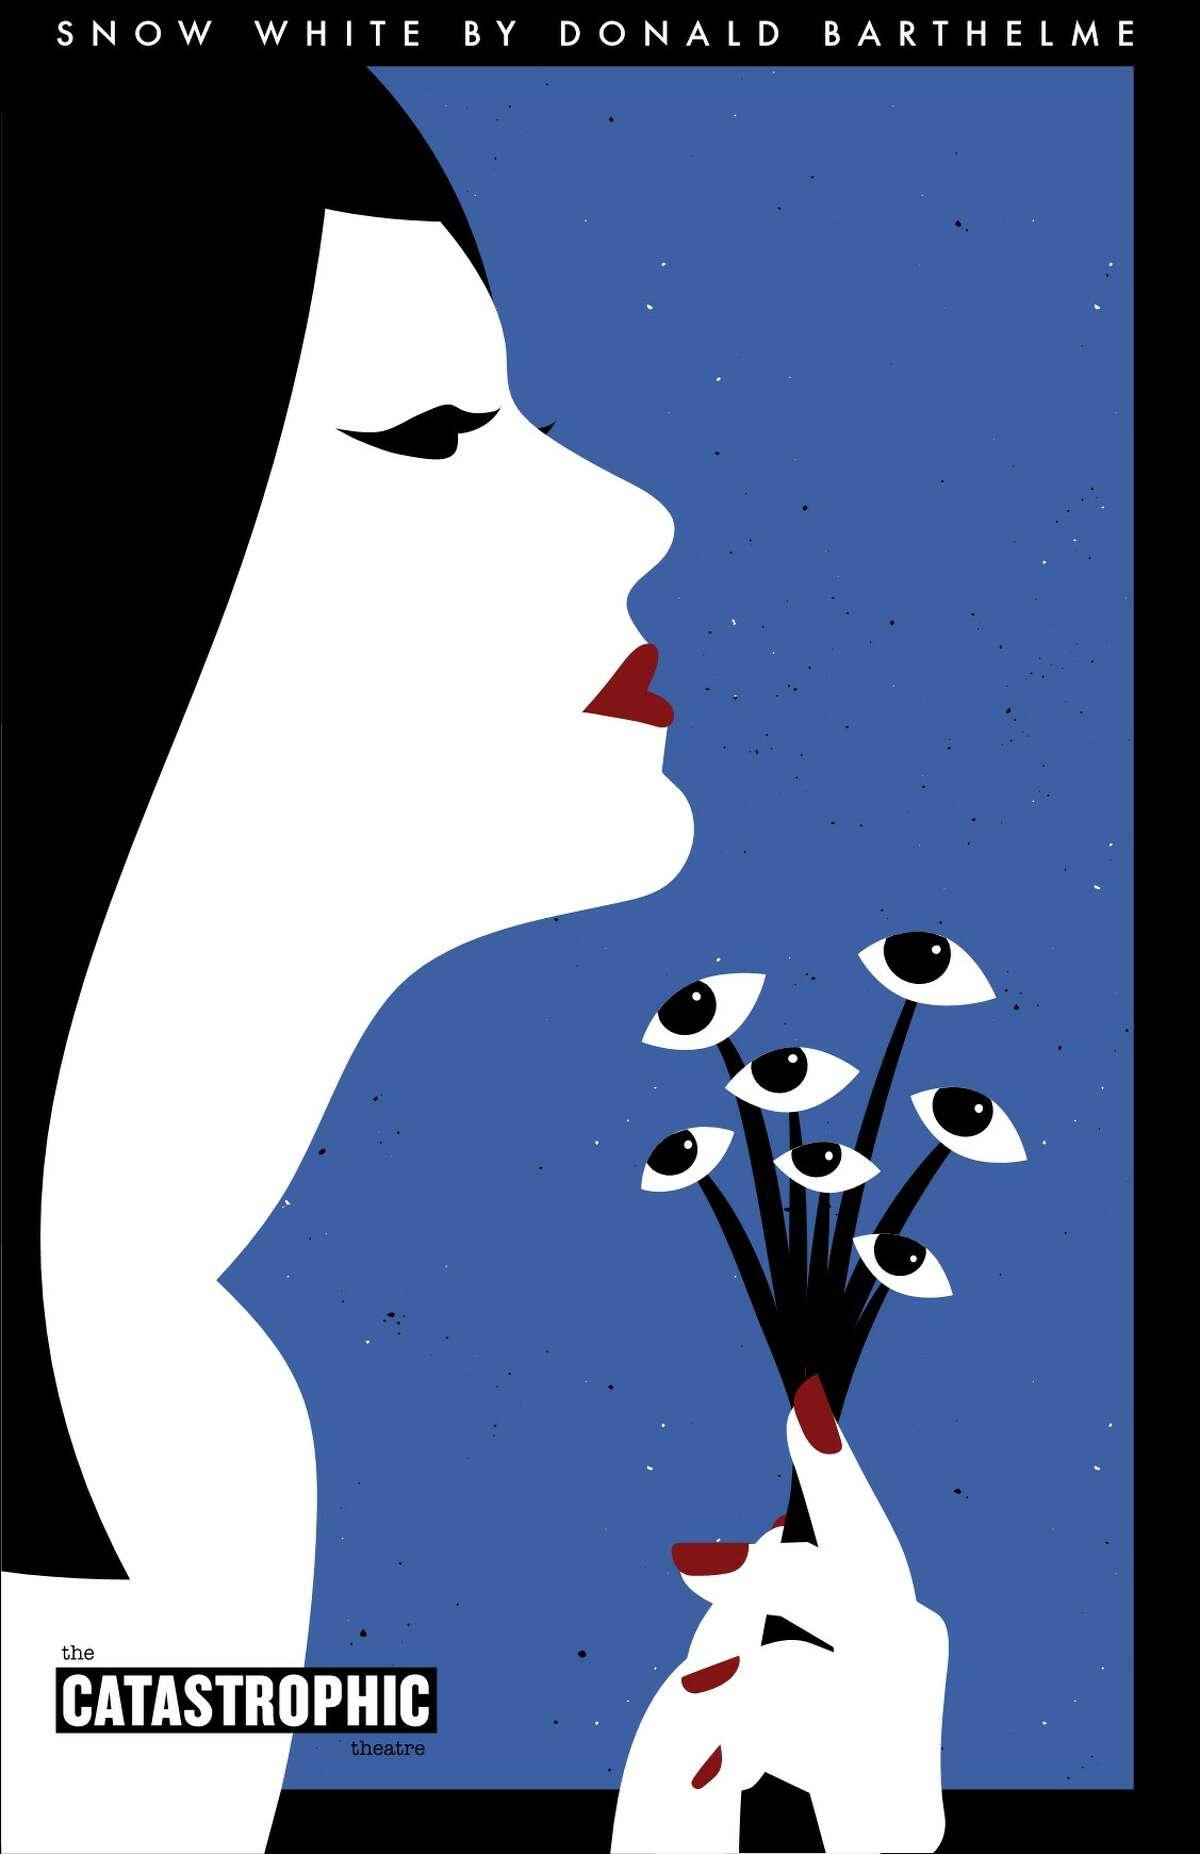 The Catastrophic Theatre presents Snow White by Donald Barthelme.